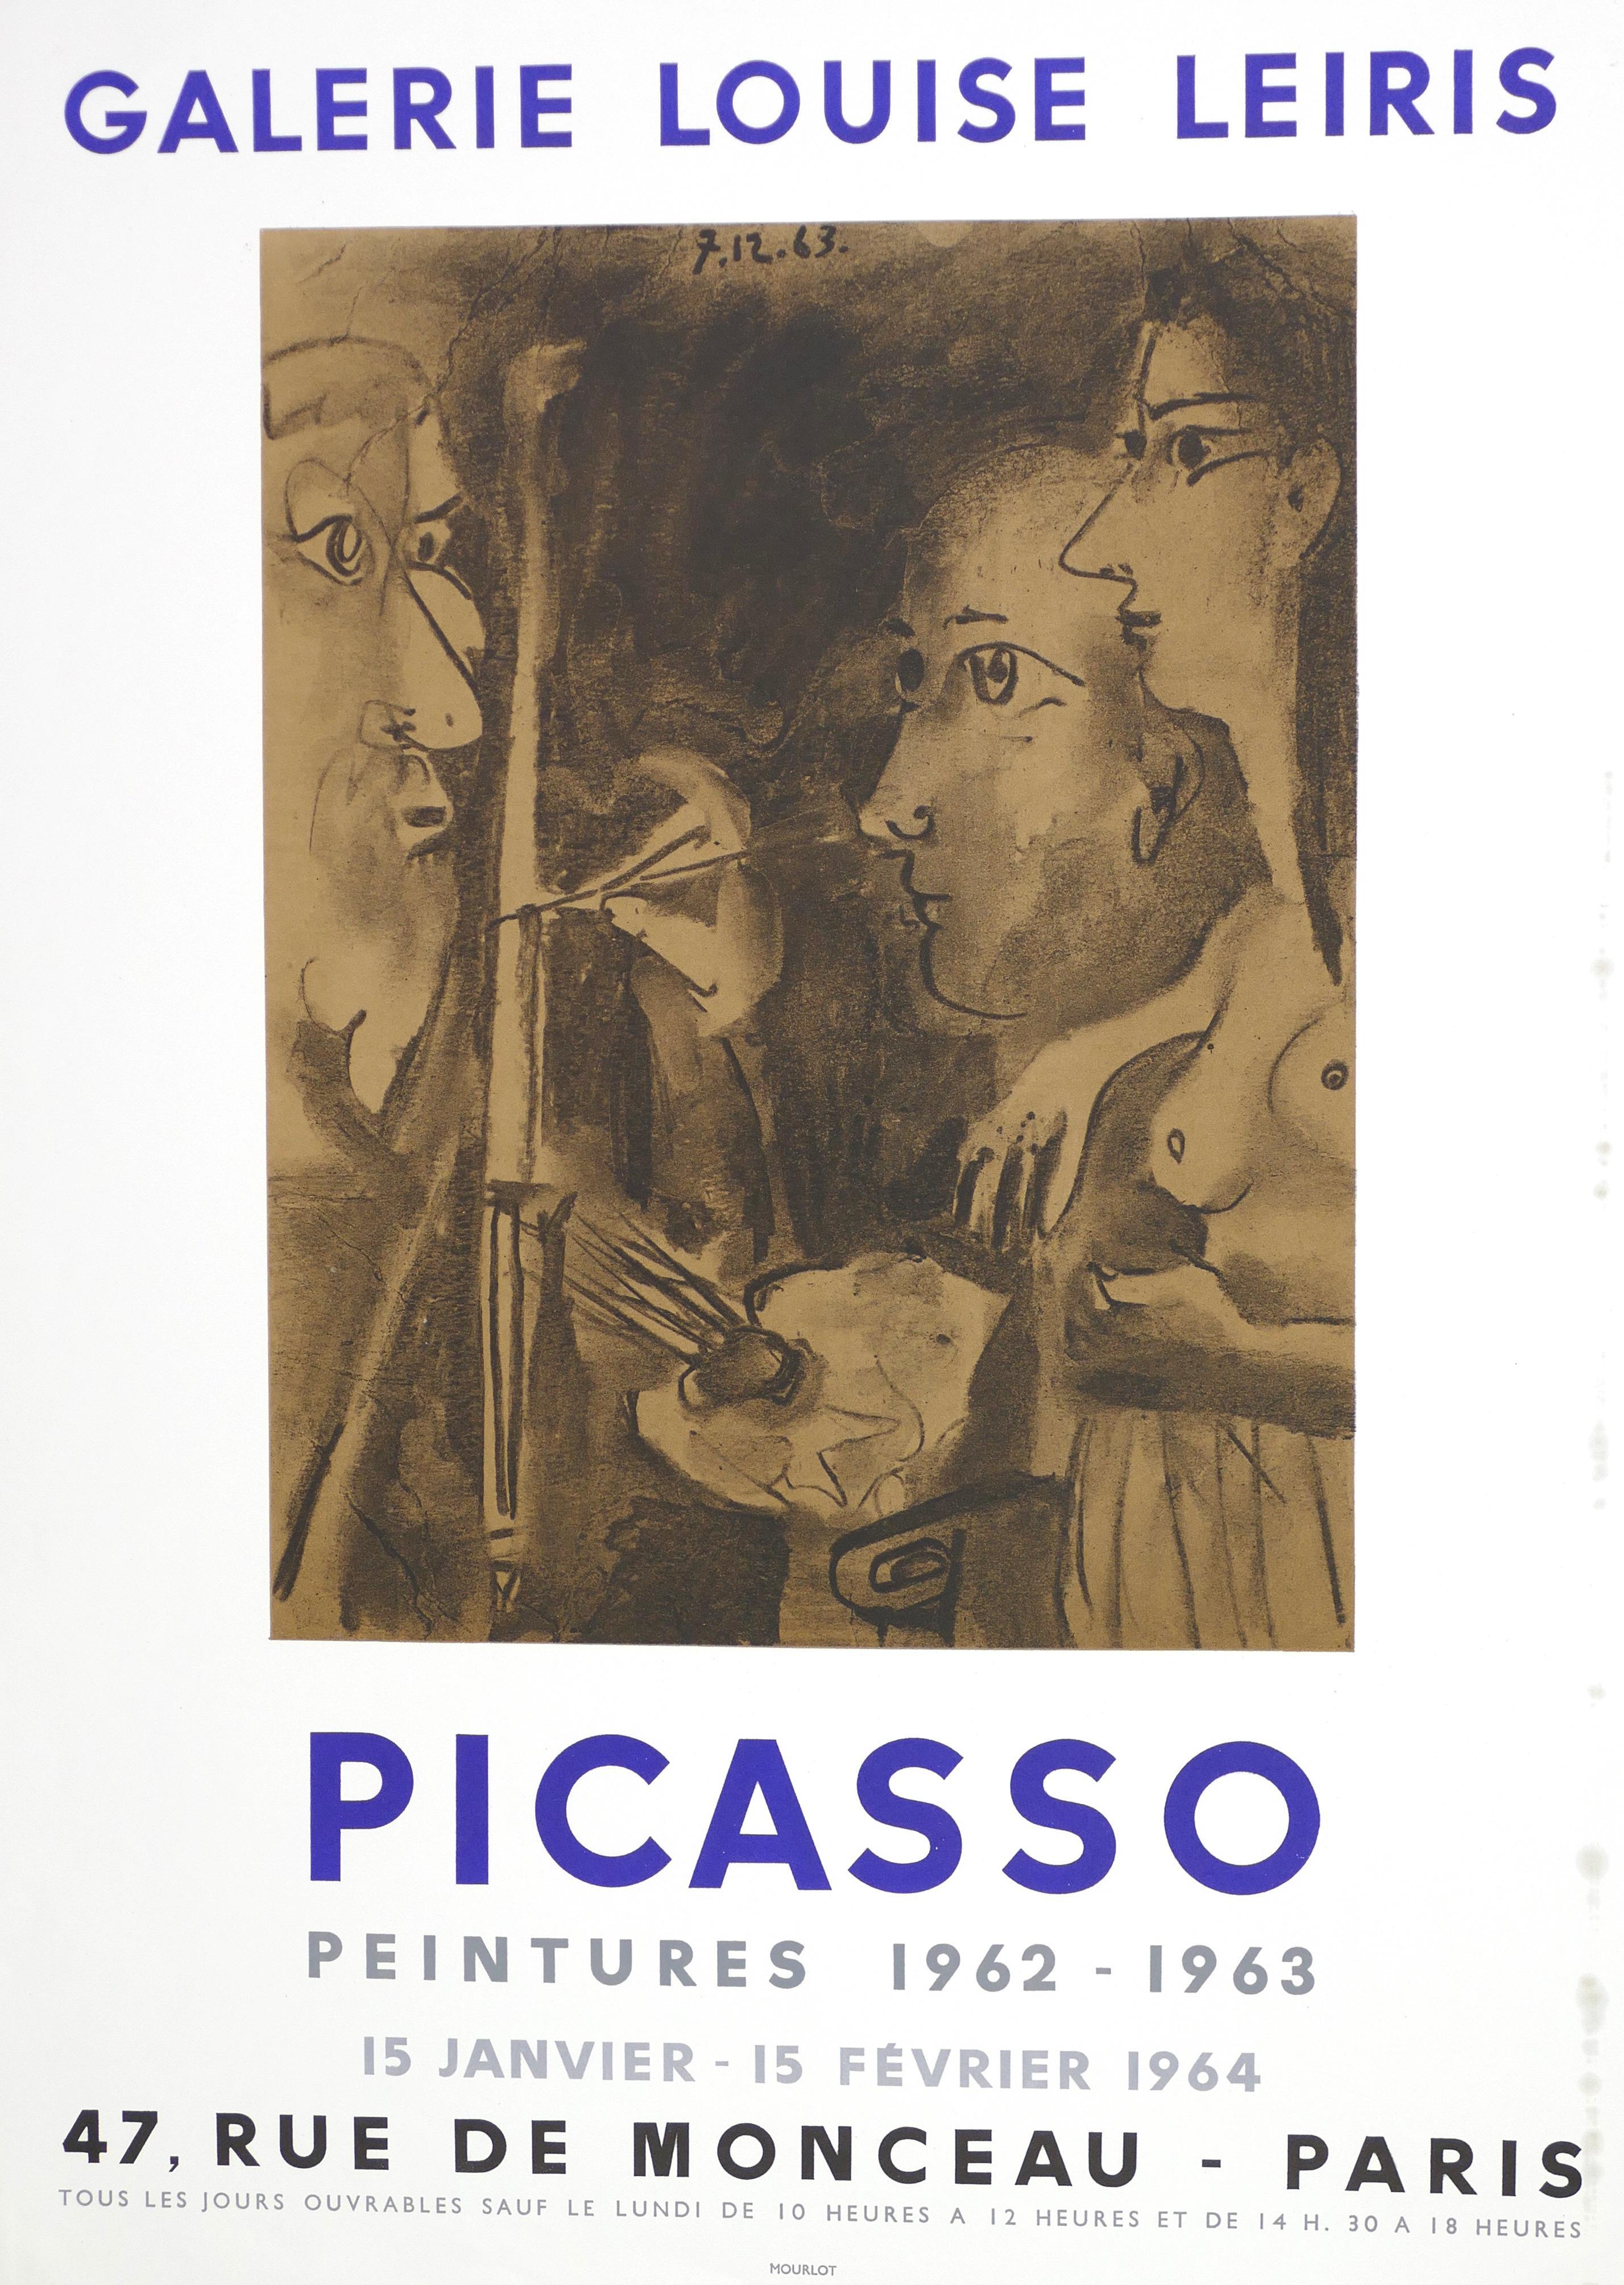 Picasso Vintage Exhibition Poster in Paris - 1964